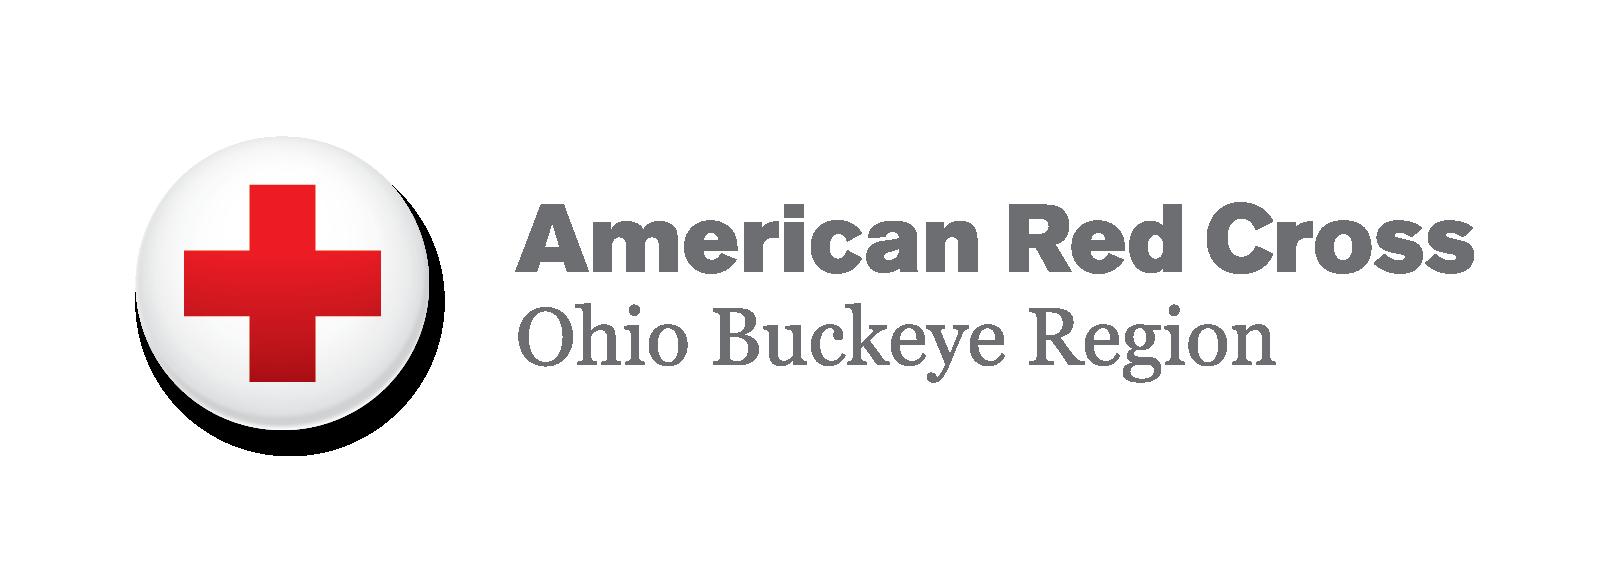 Ohio Buckeye Region Sleeves Up Hearts Open All In